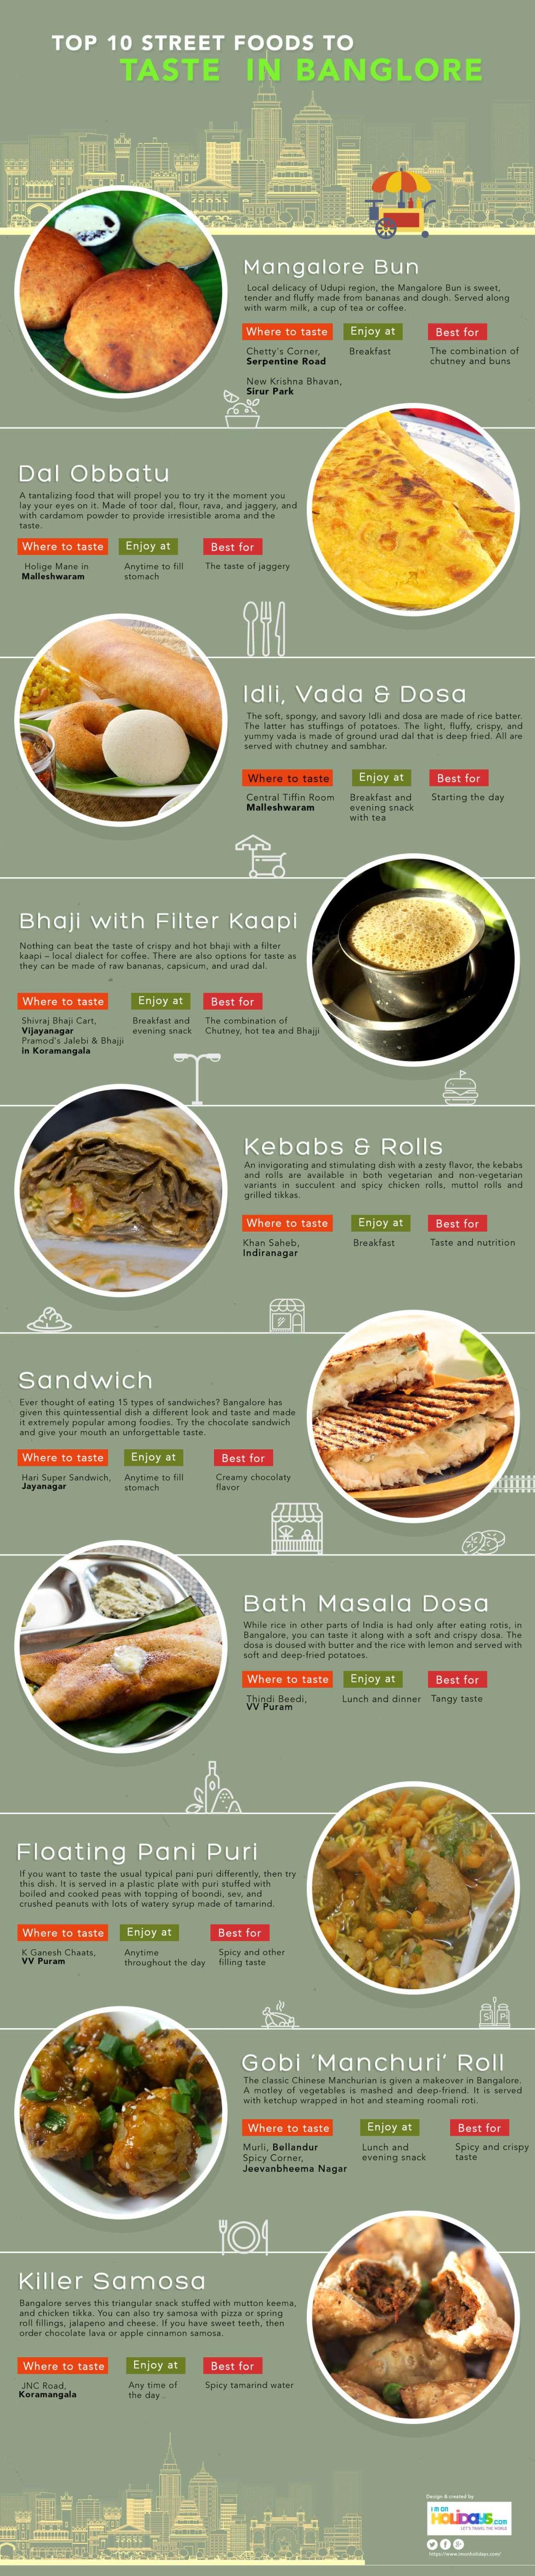 banglore street foods